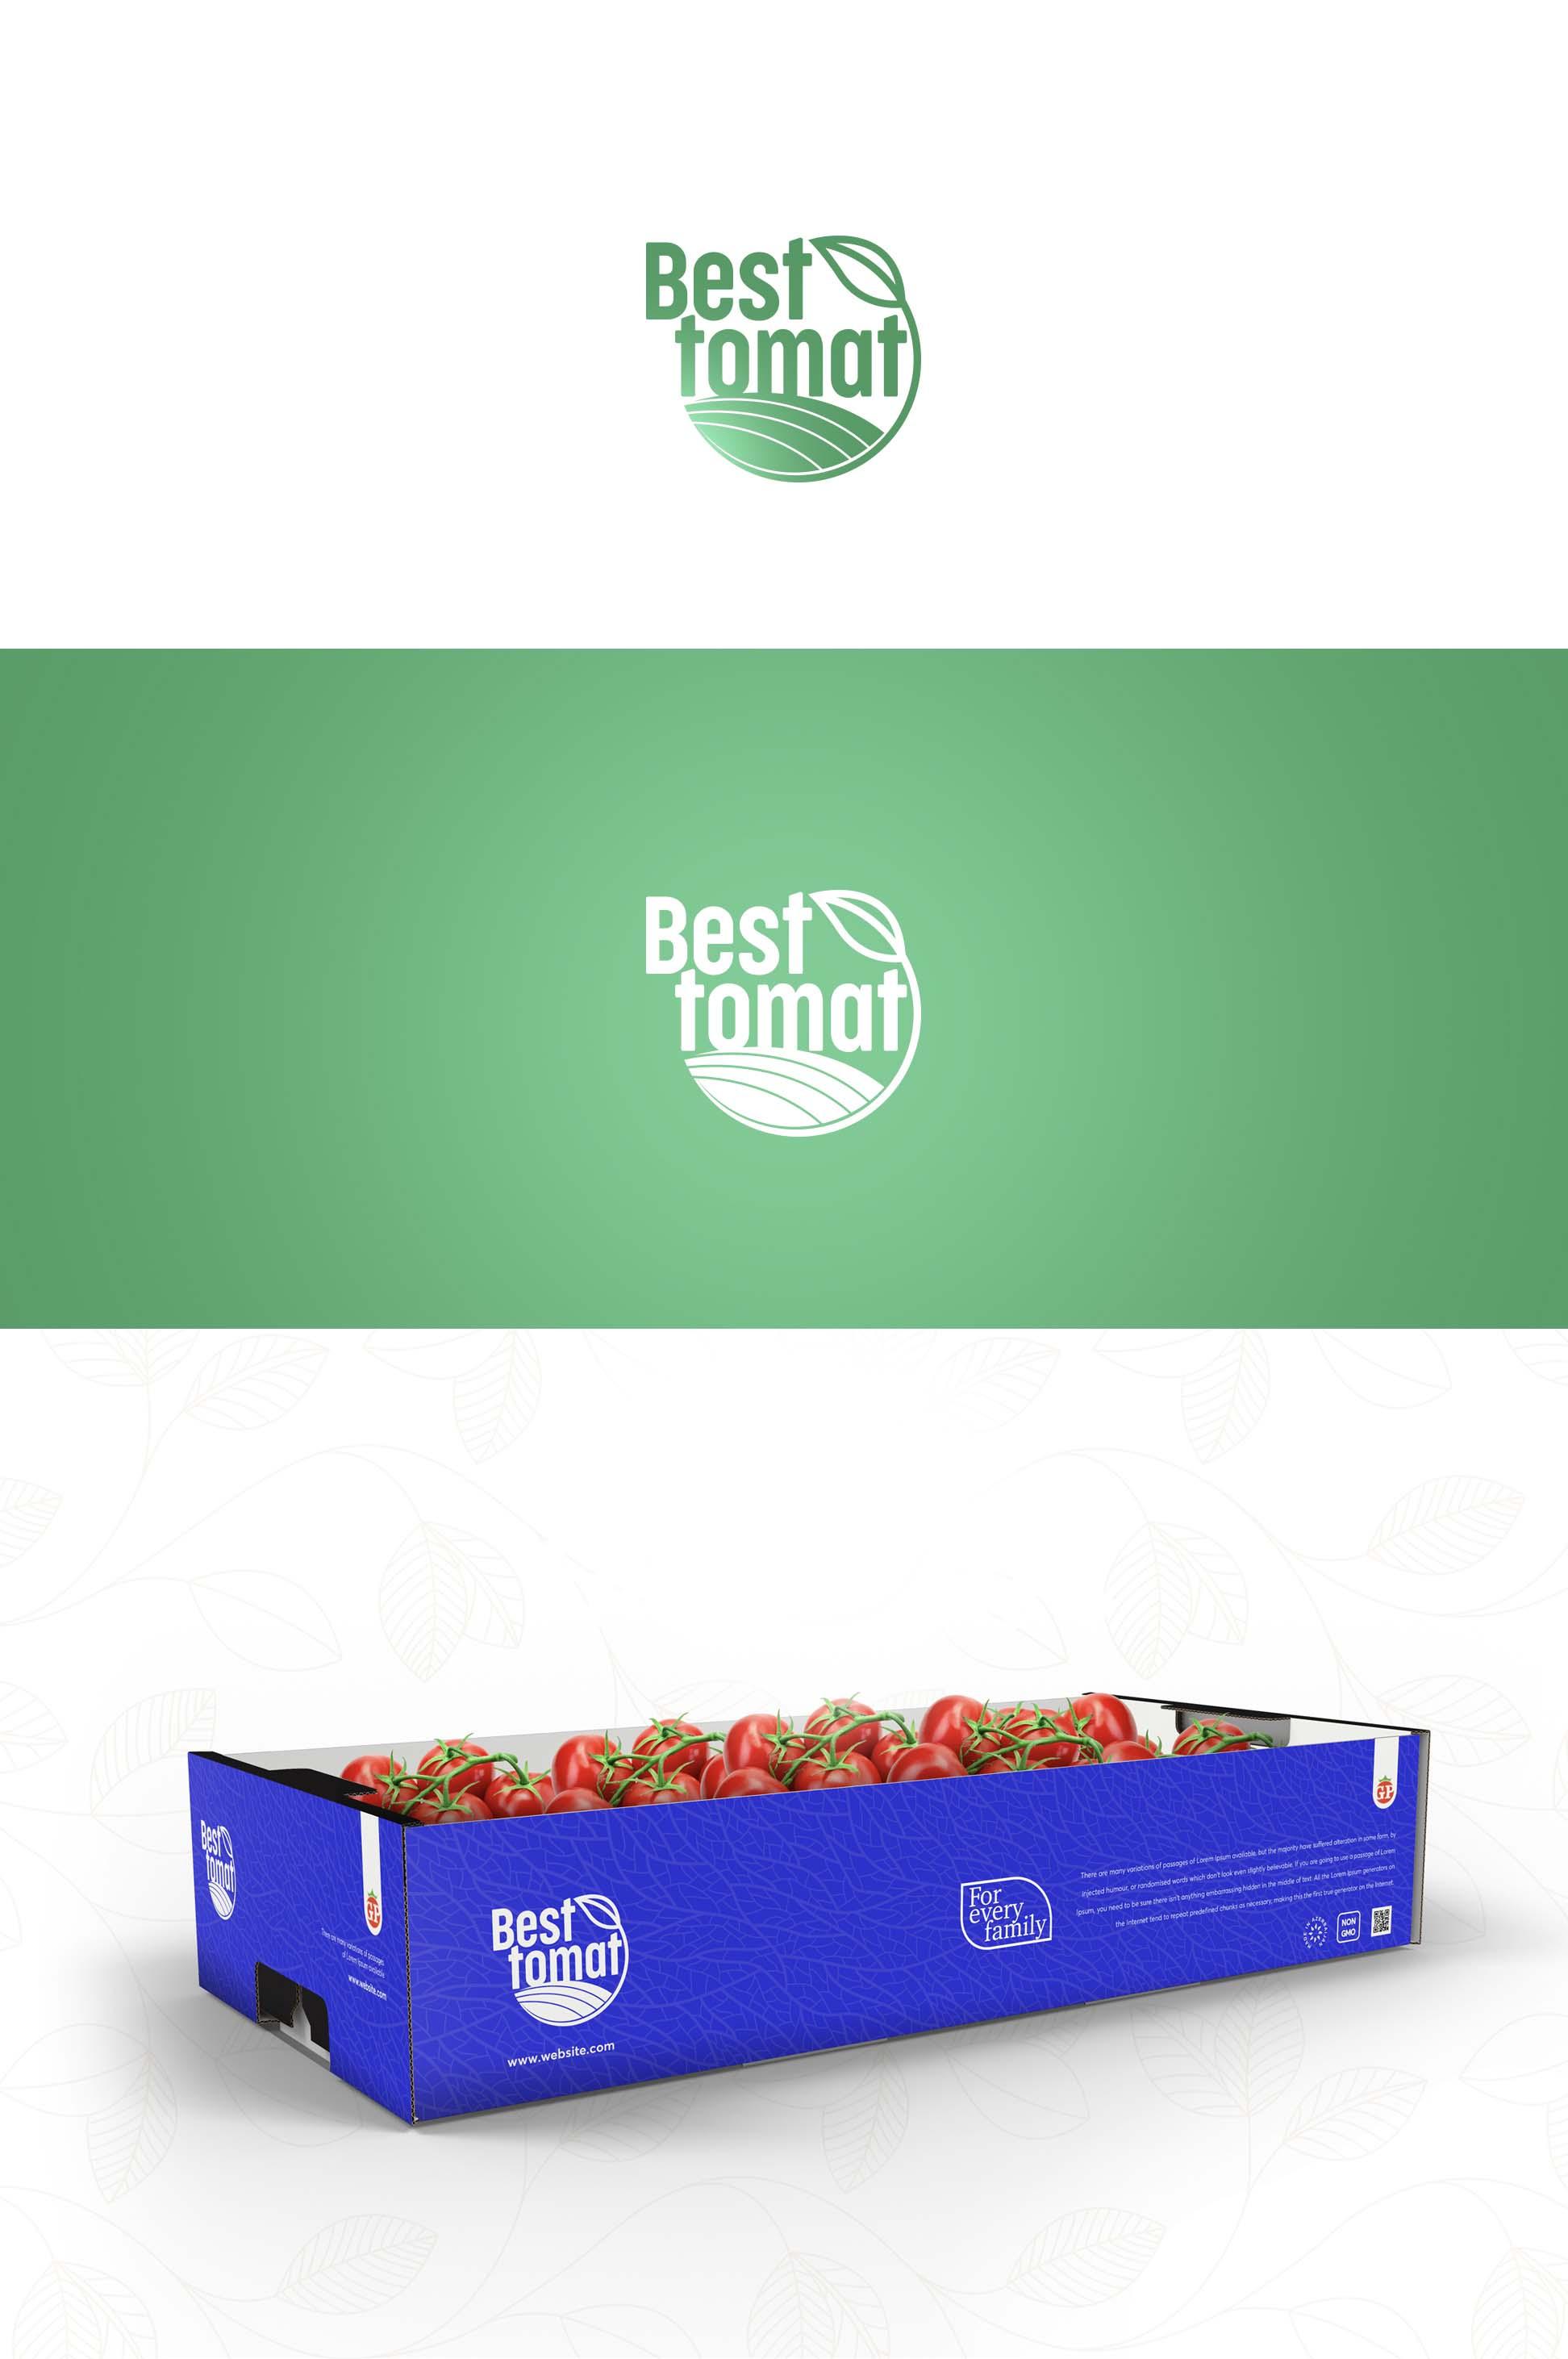 Best Tomat